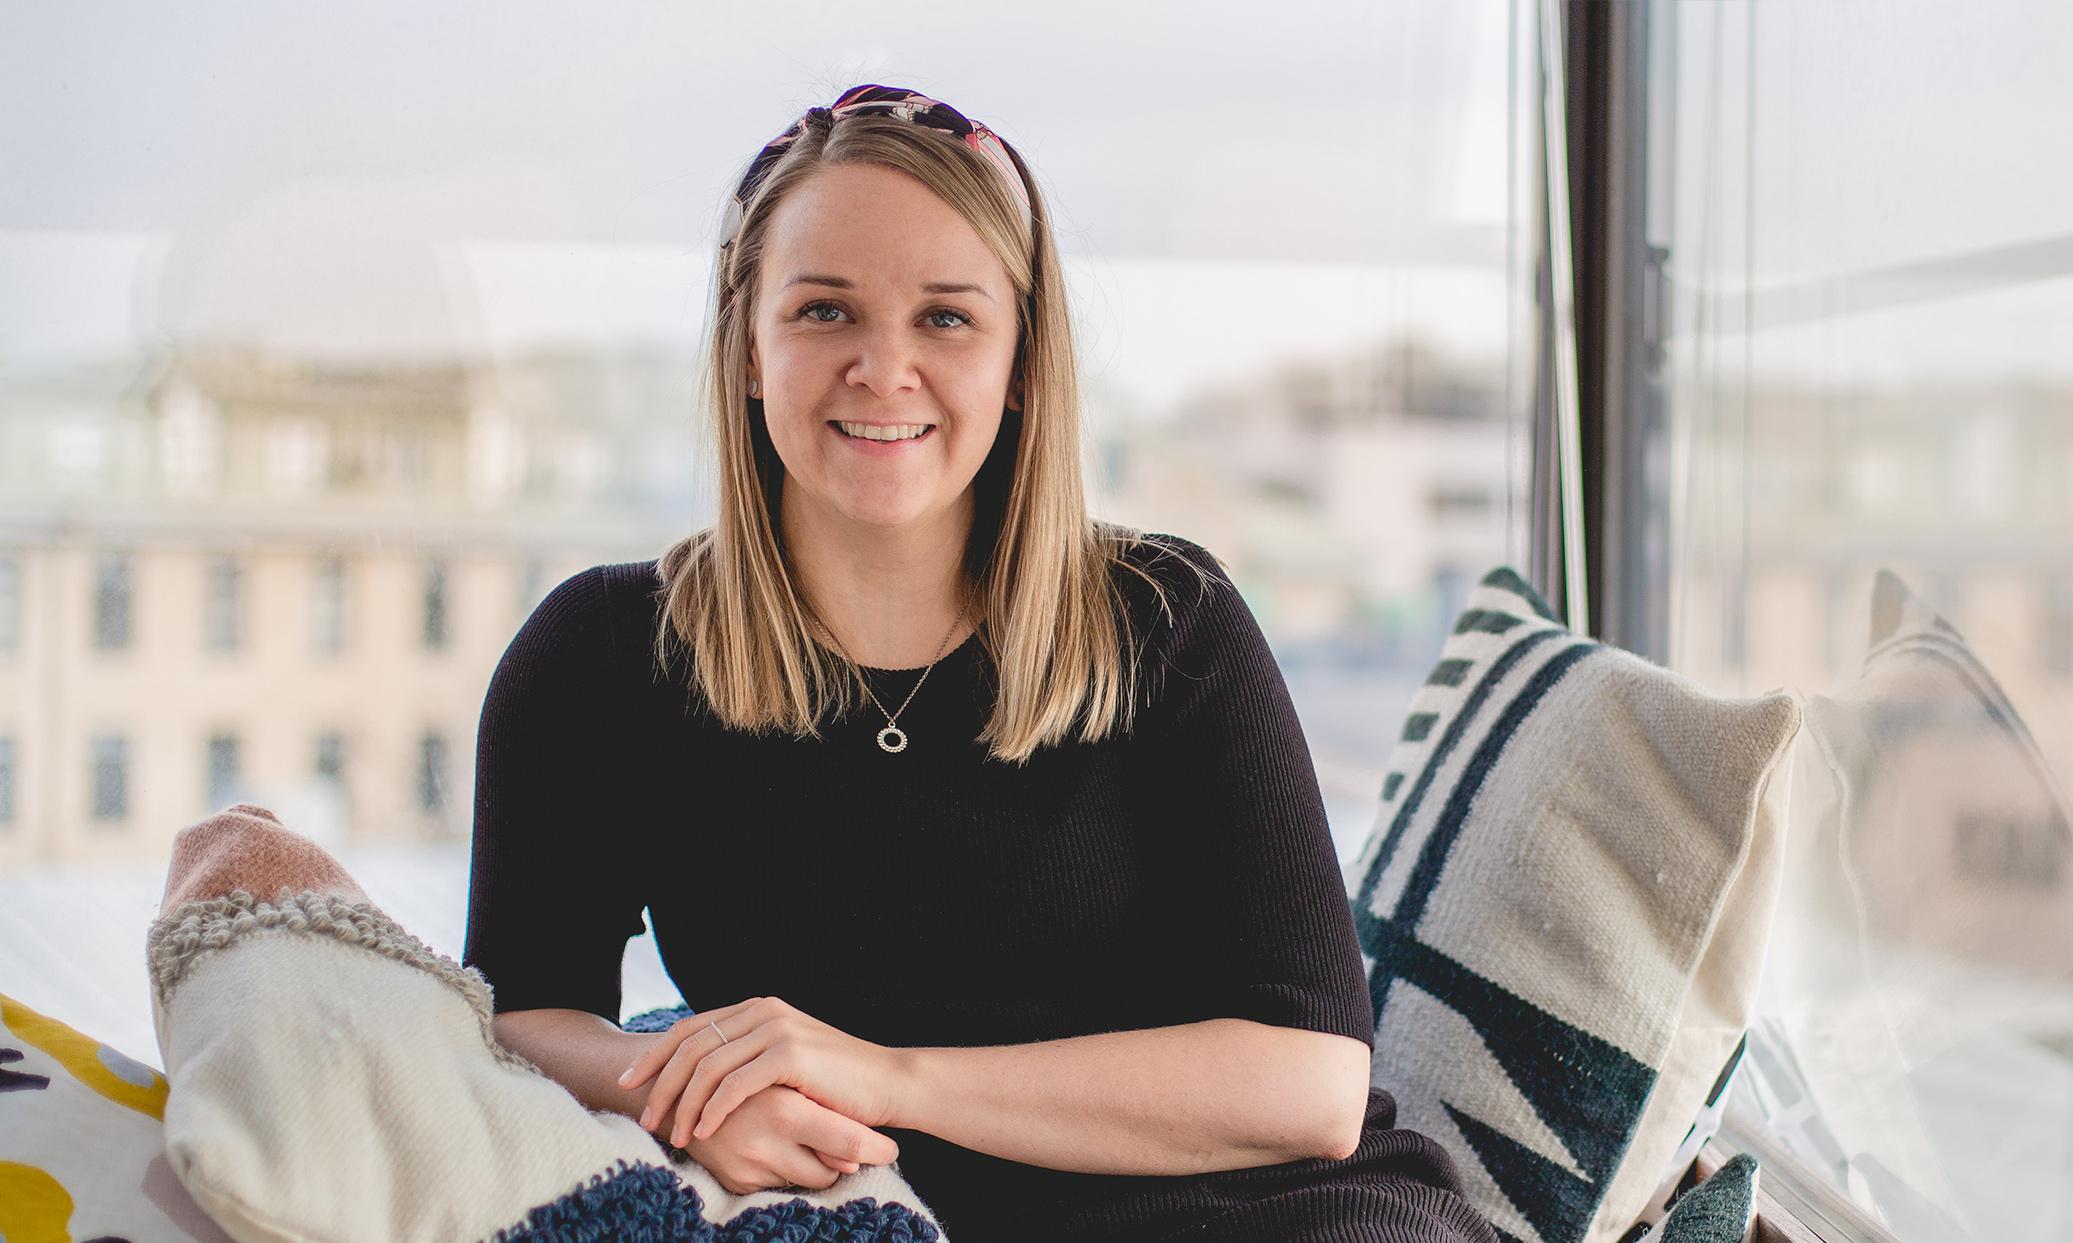 Photo of Niina Långström at the office.